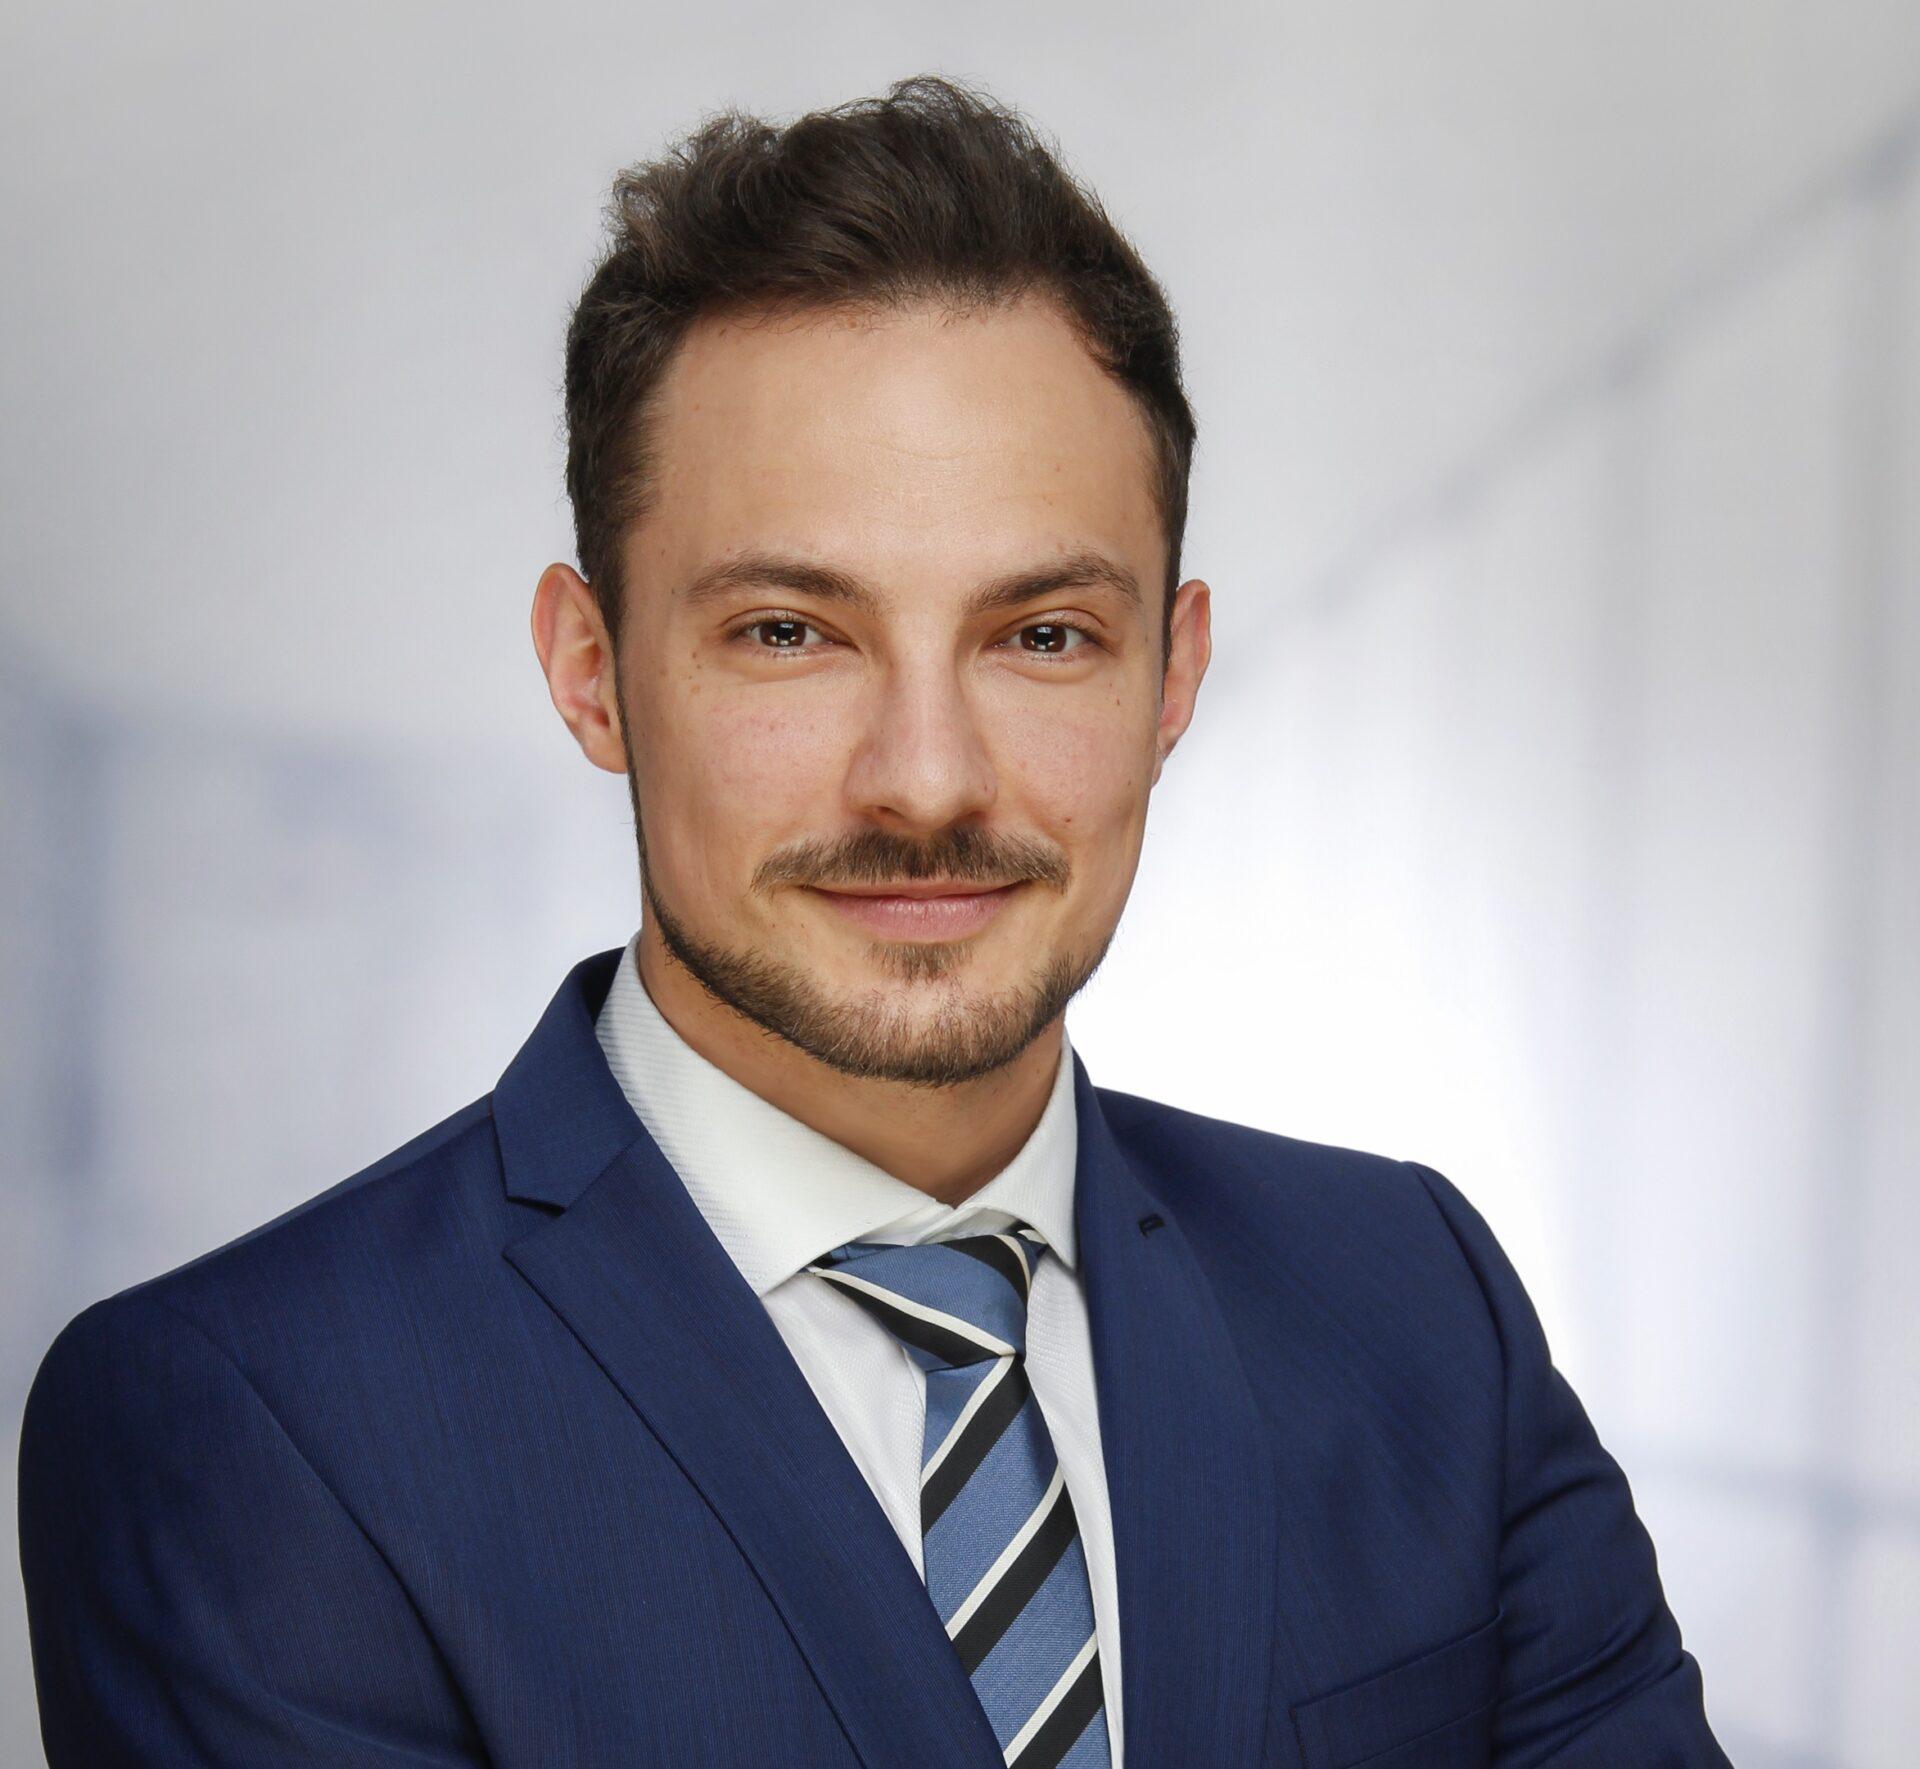 Tobias Donner